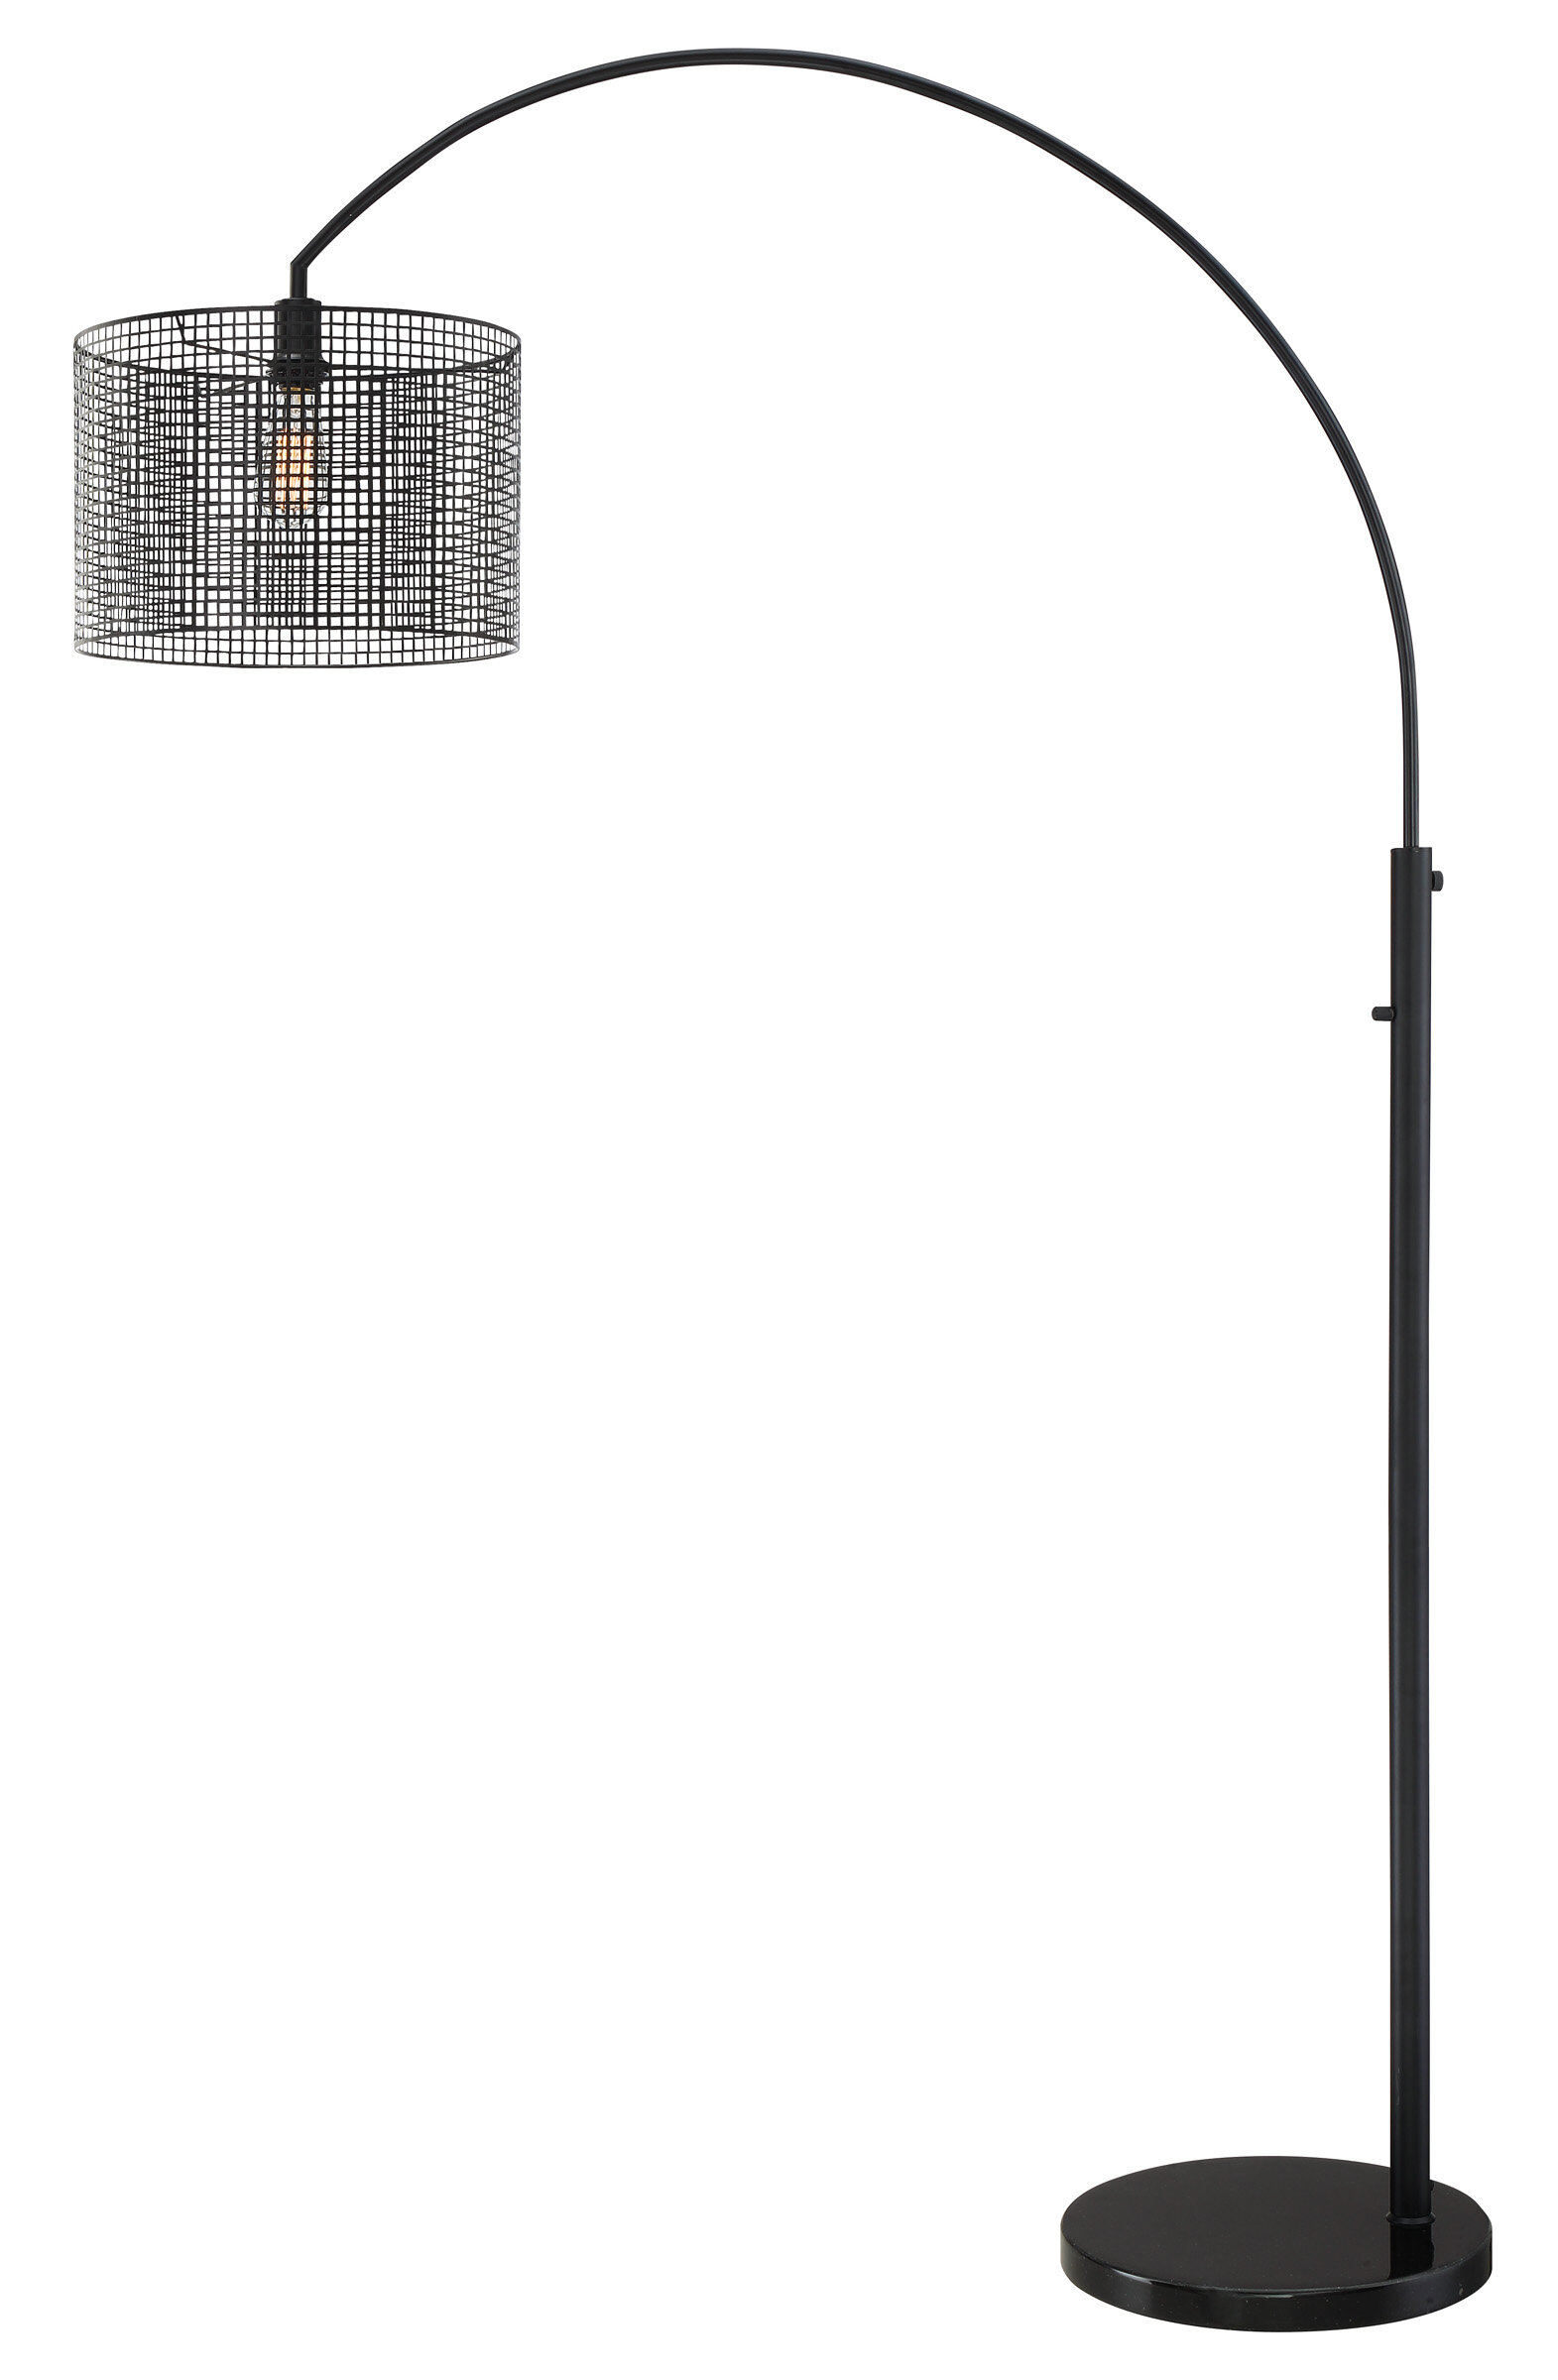 Image of: Elle 79 5 Arched Floor Lamp Reviews Allmodern